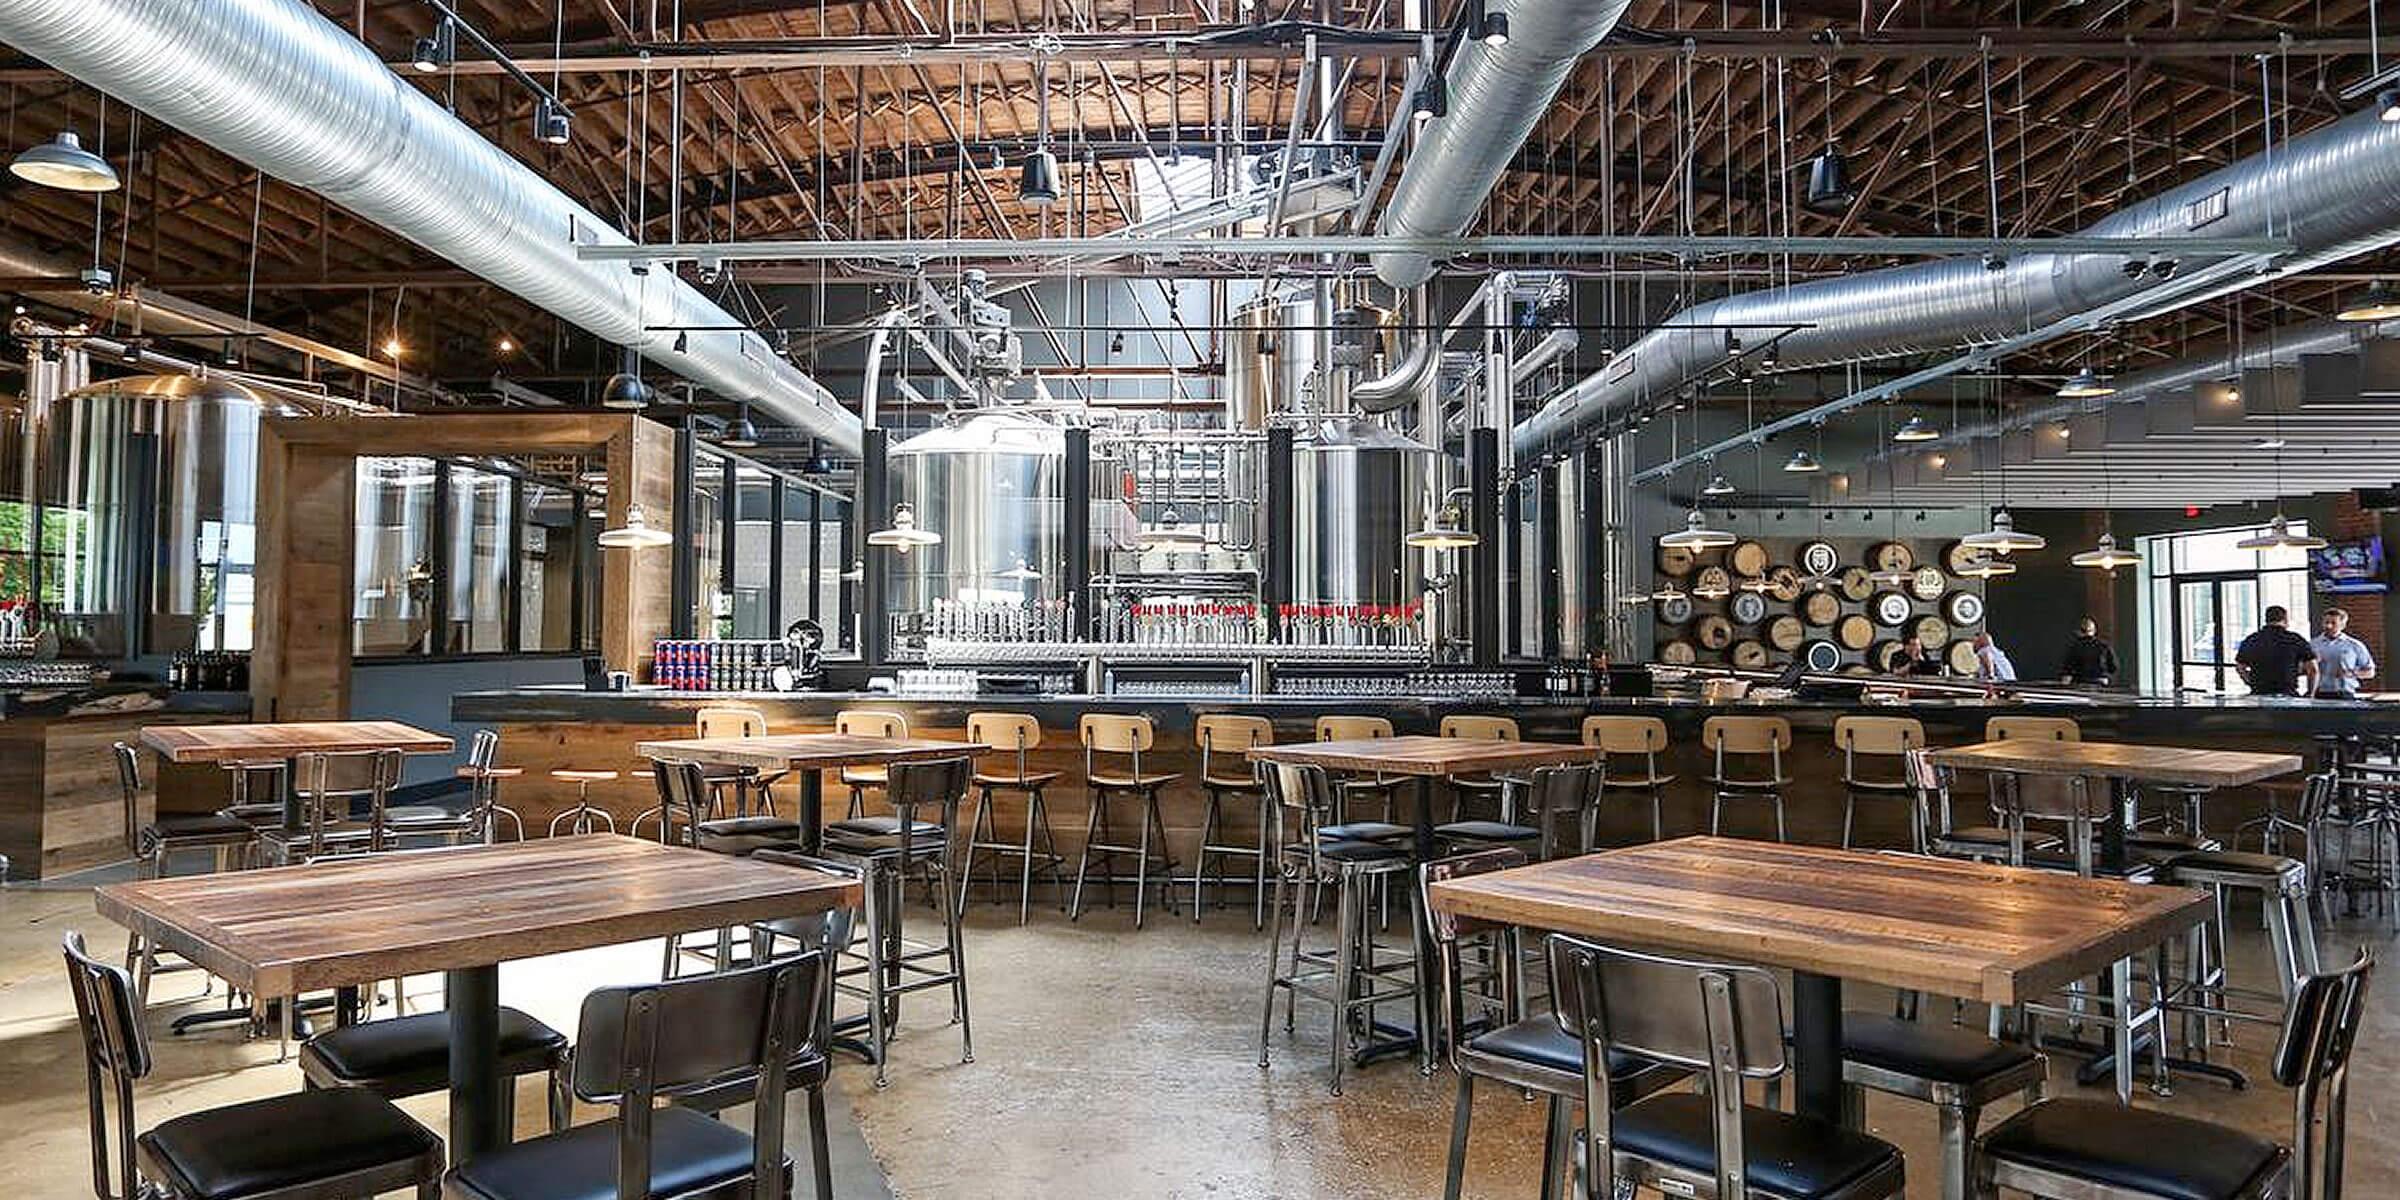 Inside the tasting room at Artisanal Brewing Ventures in Charlotte, North Carolina